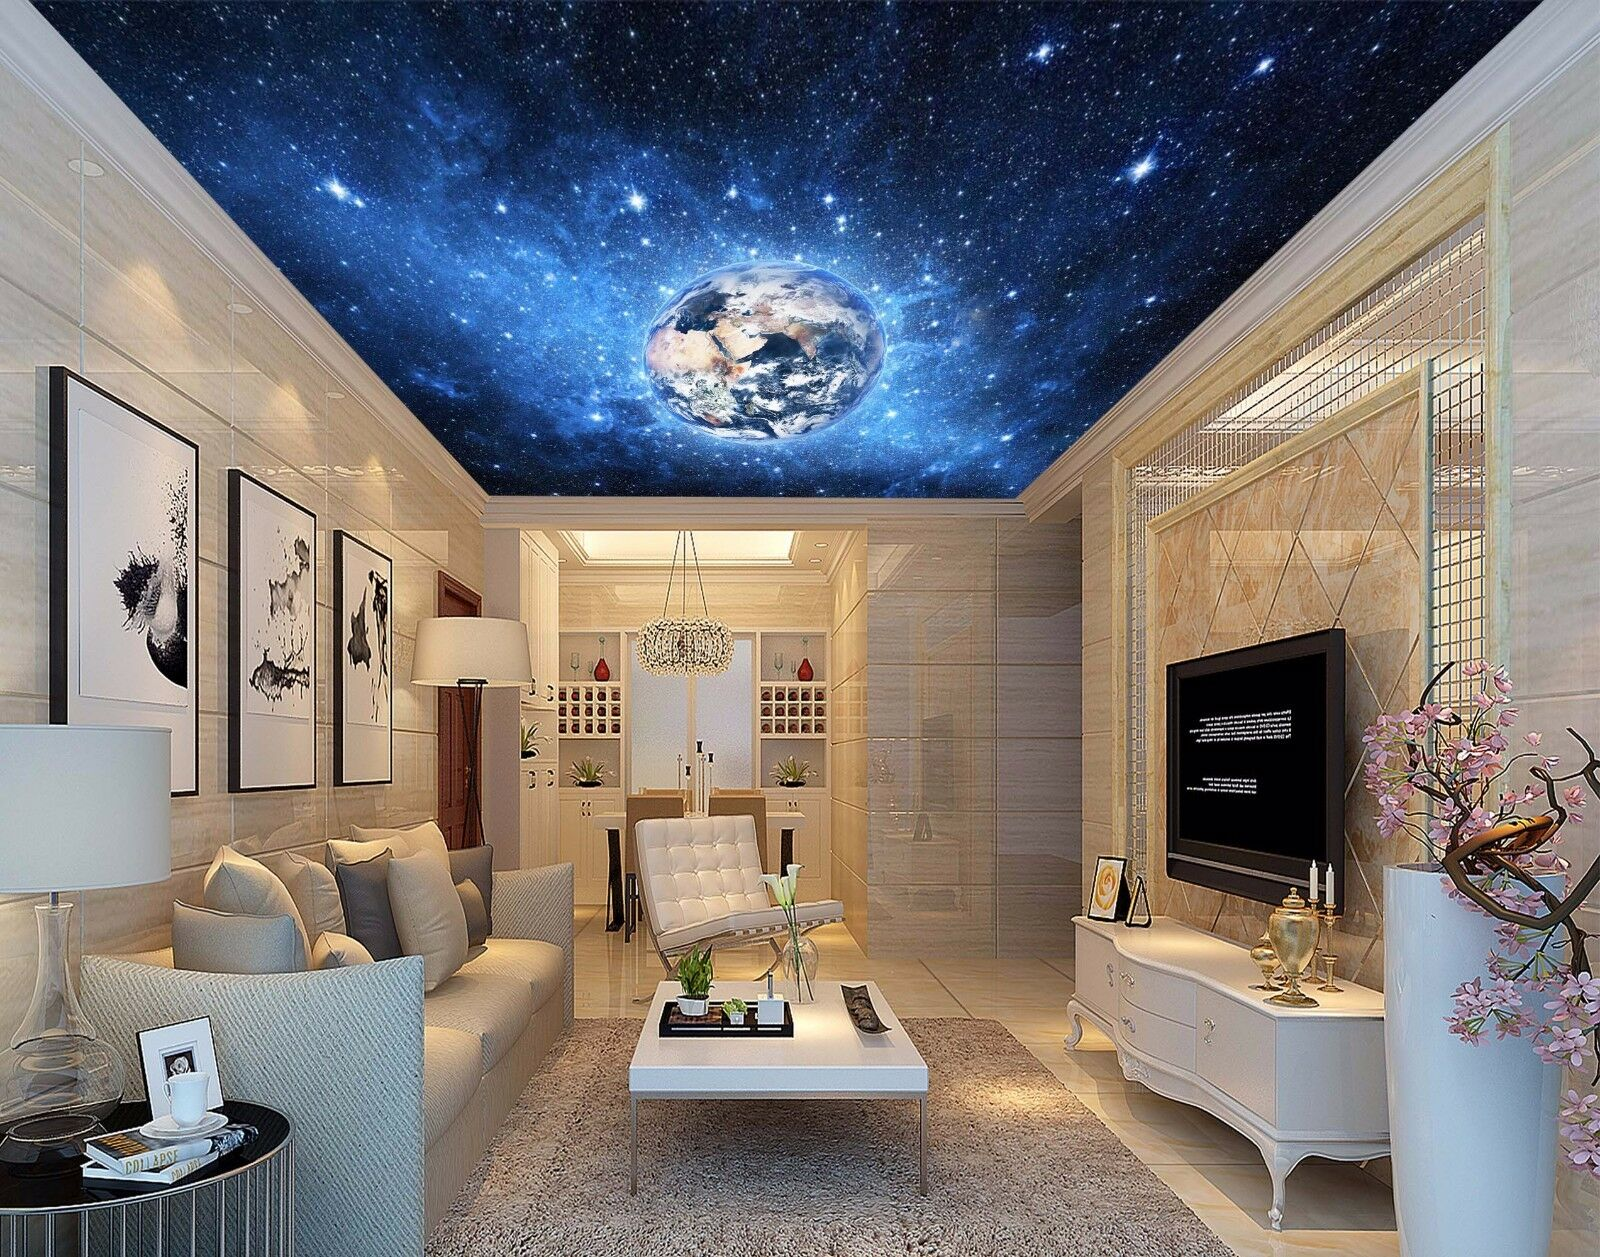 3D Stars Earth 43 Ceiling WallPaper Murals Wall Print Decal Deco AJ WALLPAPER UK